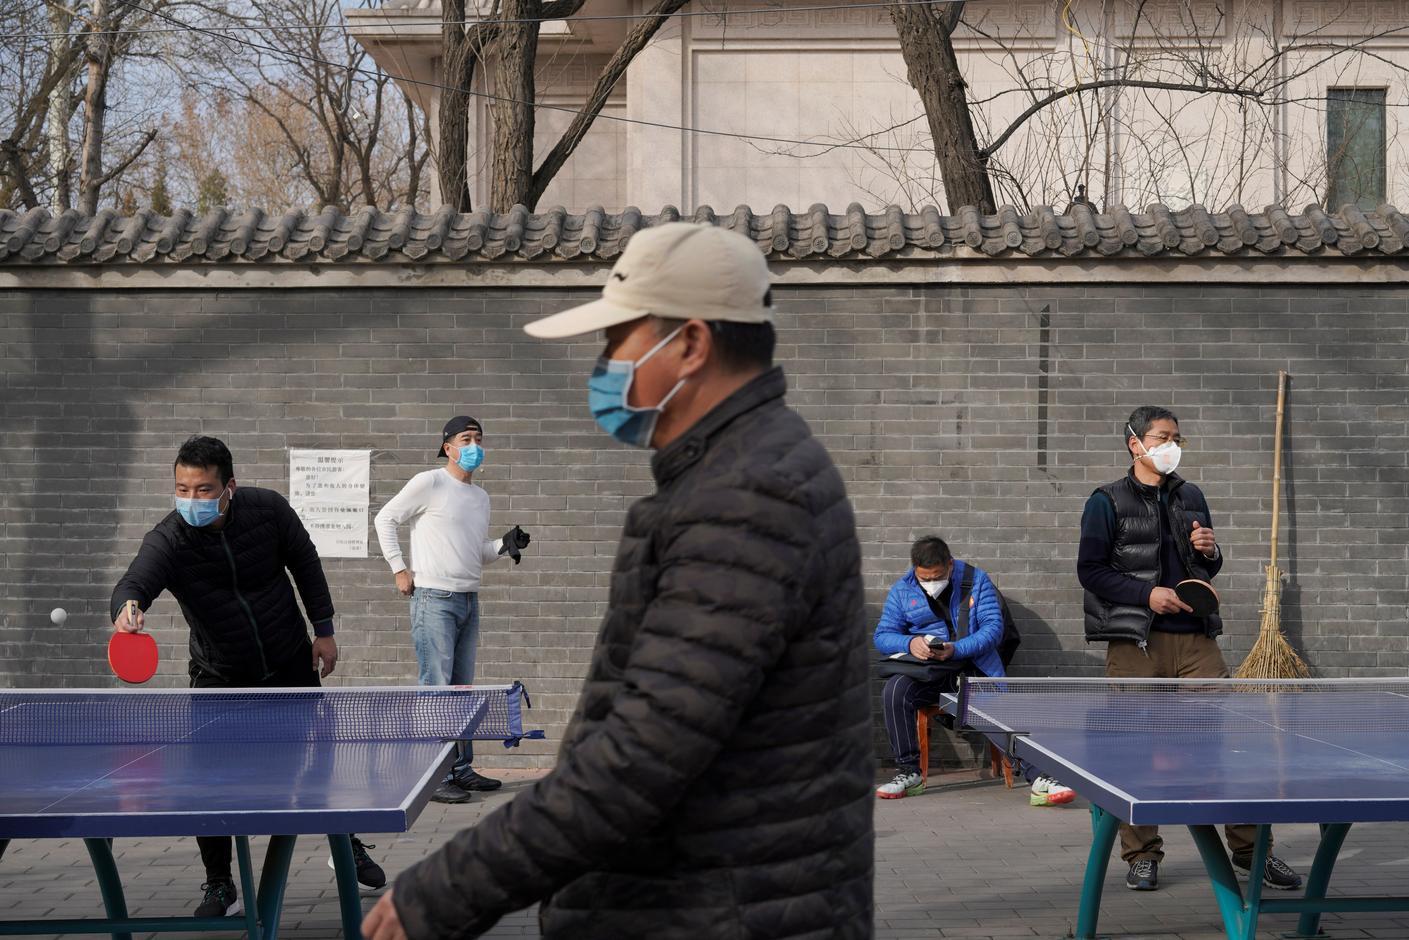 China's Hubei province reports 630 new coronavirus cases on February 22